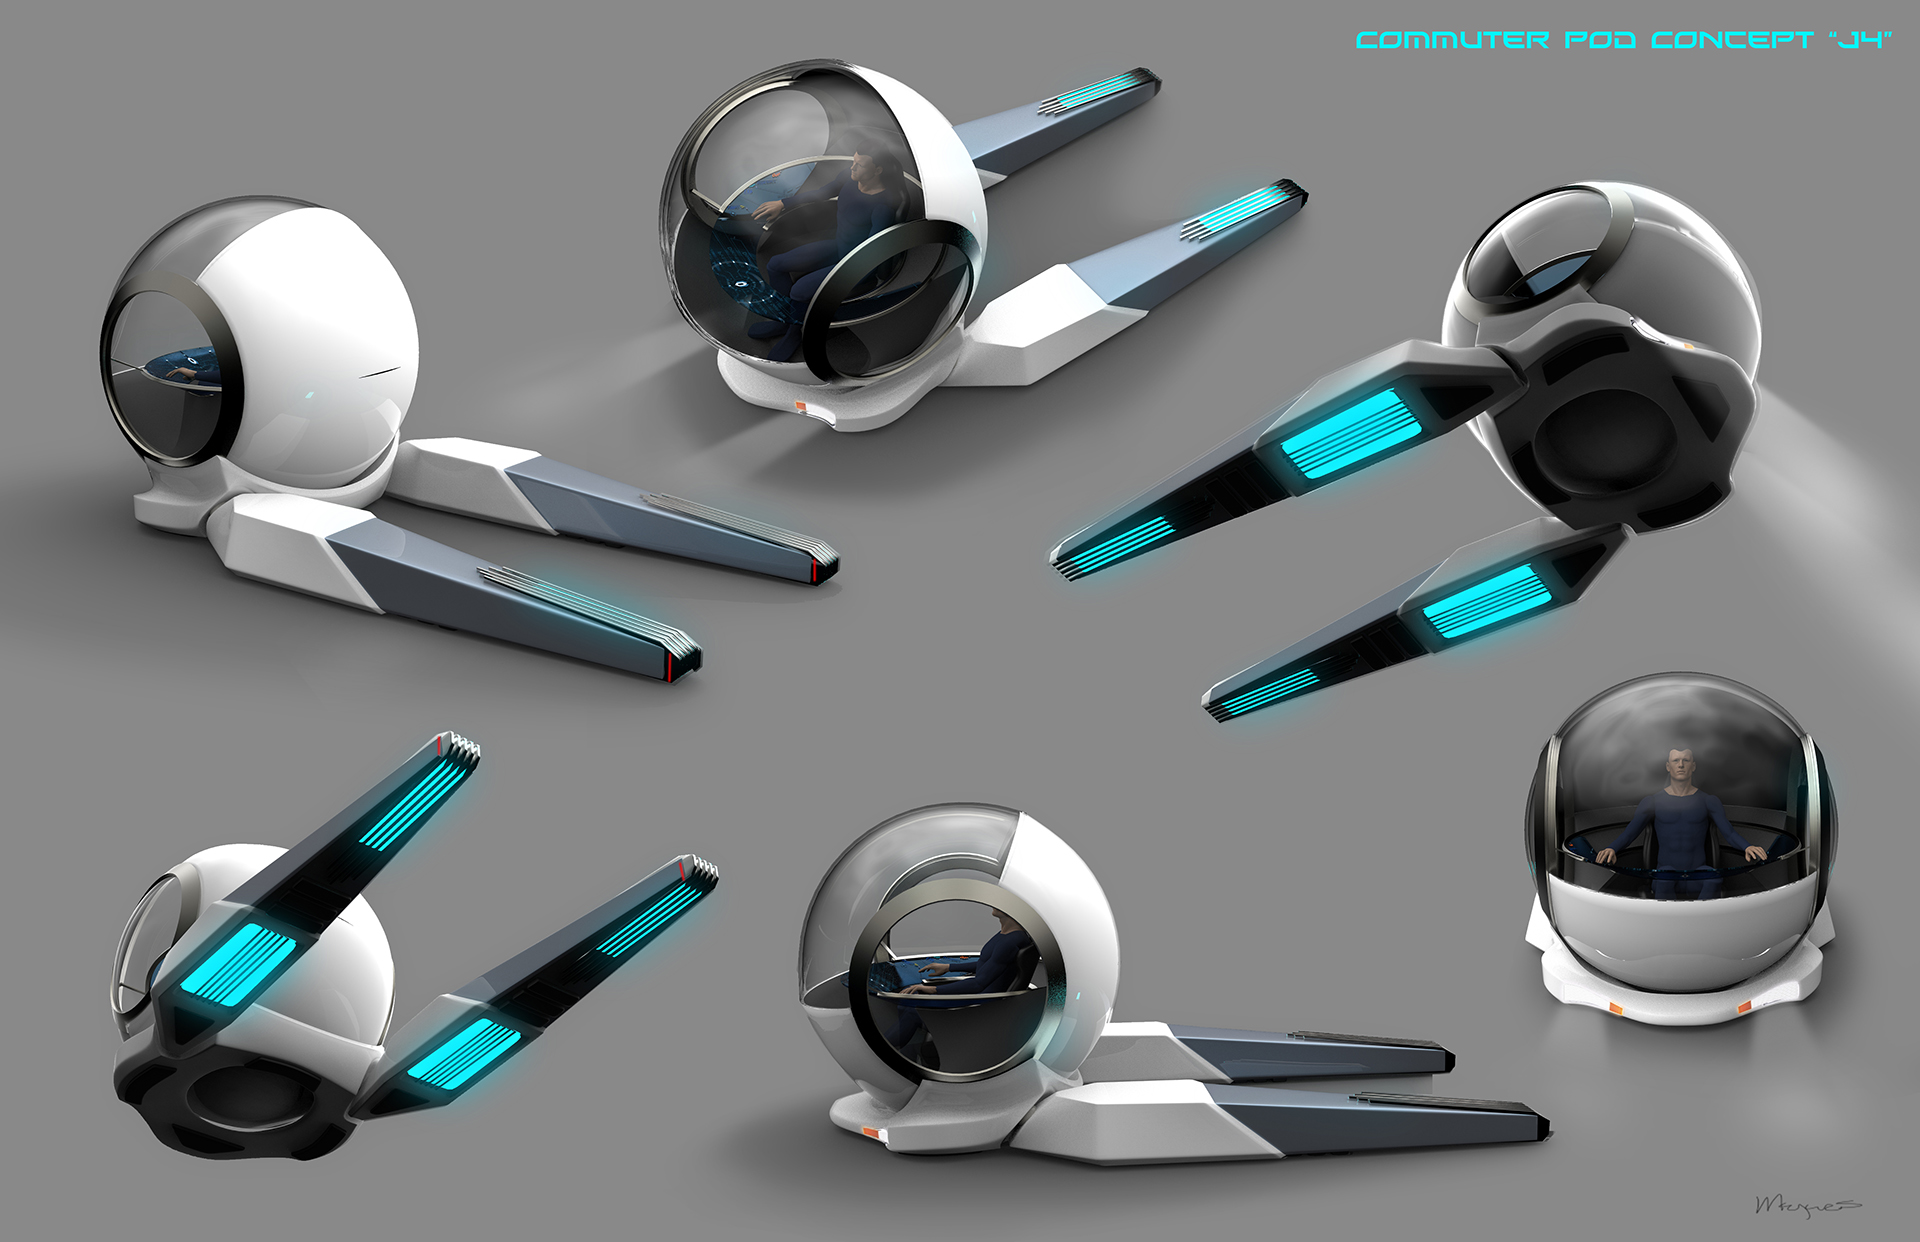 Orville Commuter Pod Concept